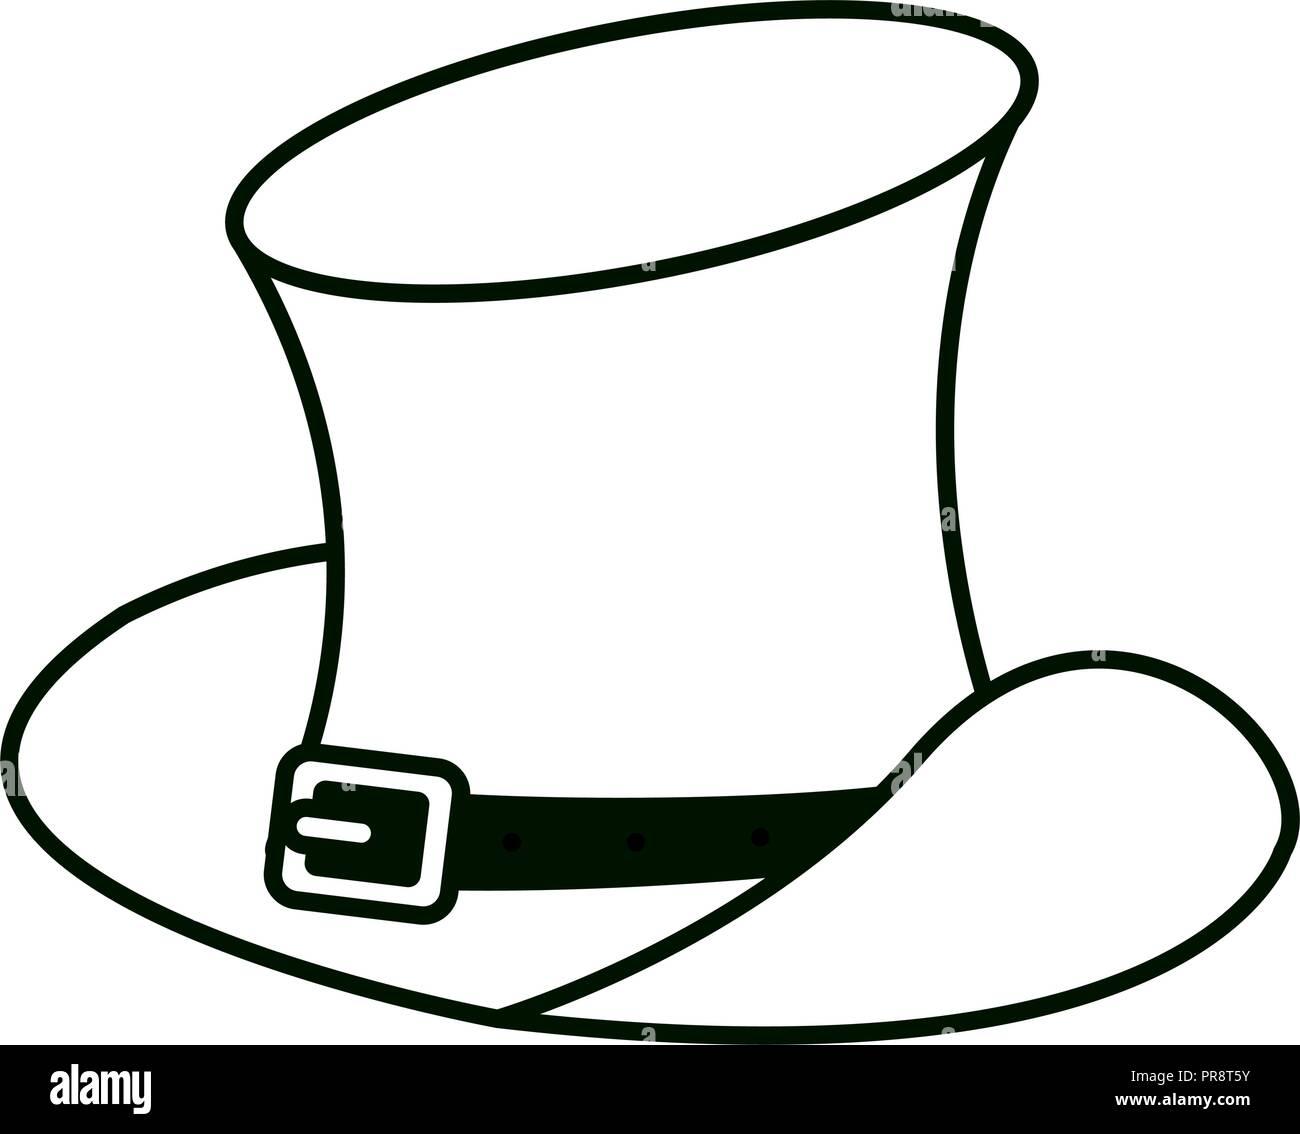 bbc2e731ea1 Black Leprechaun Stock Vector Images - Alamy